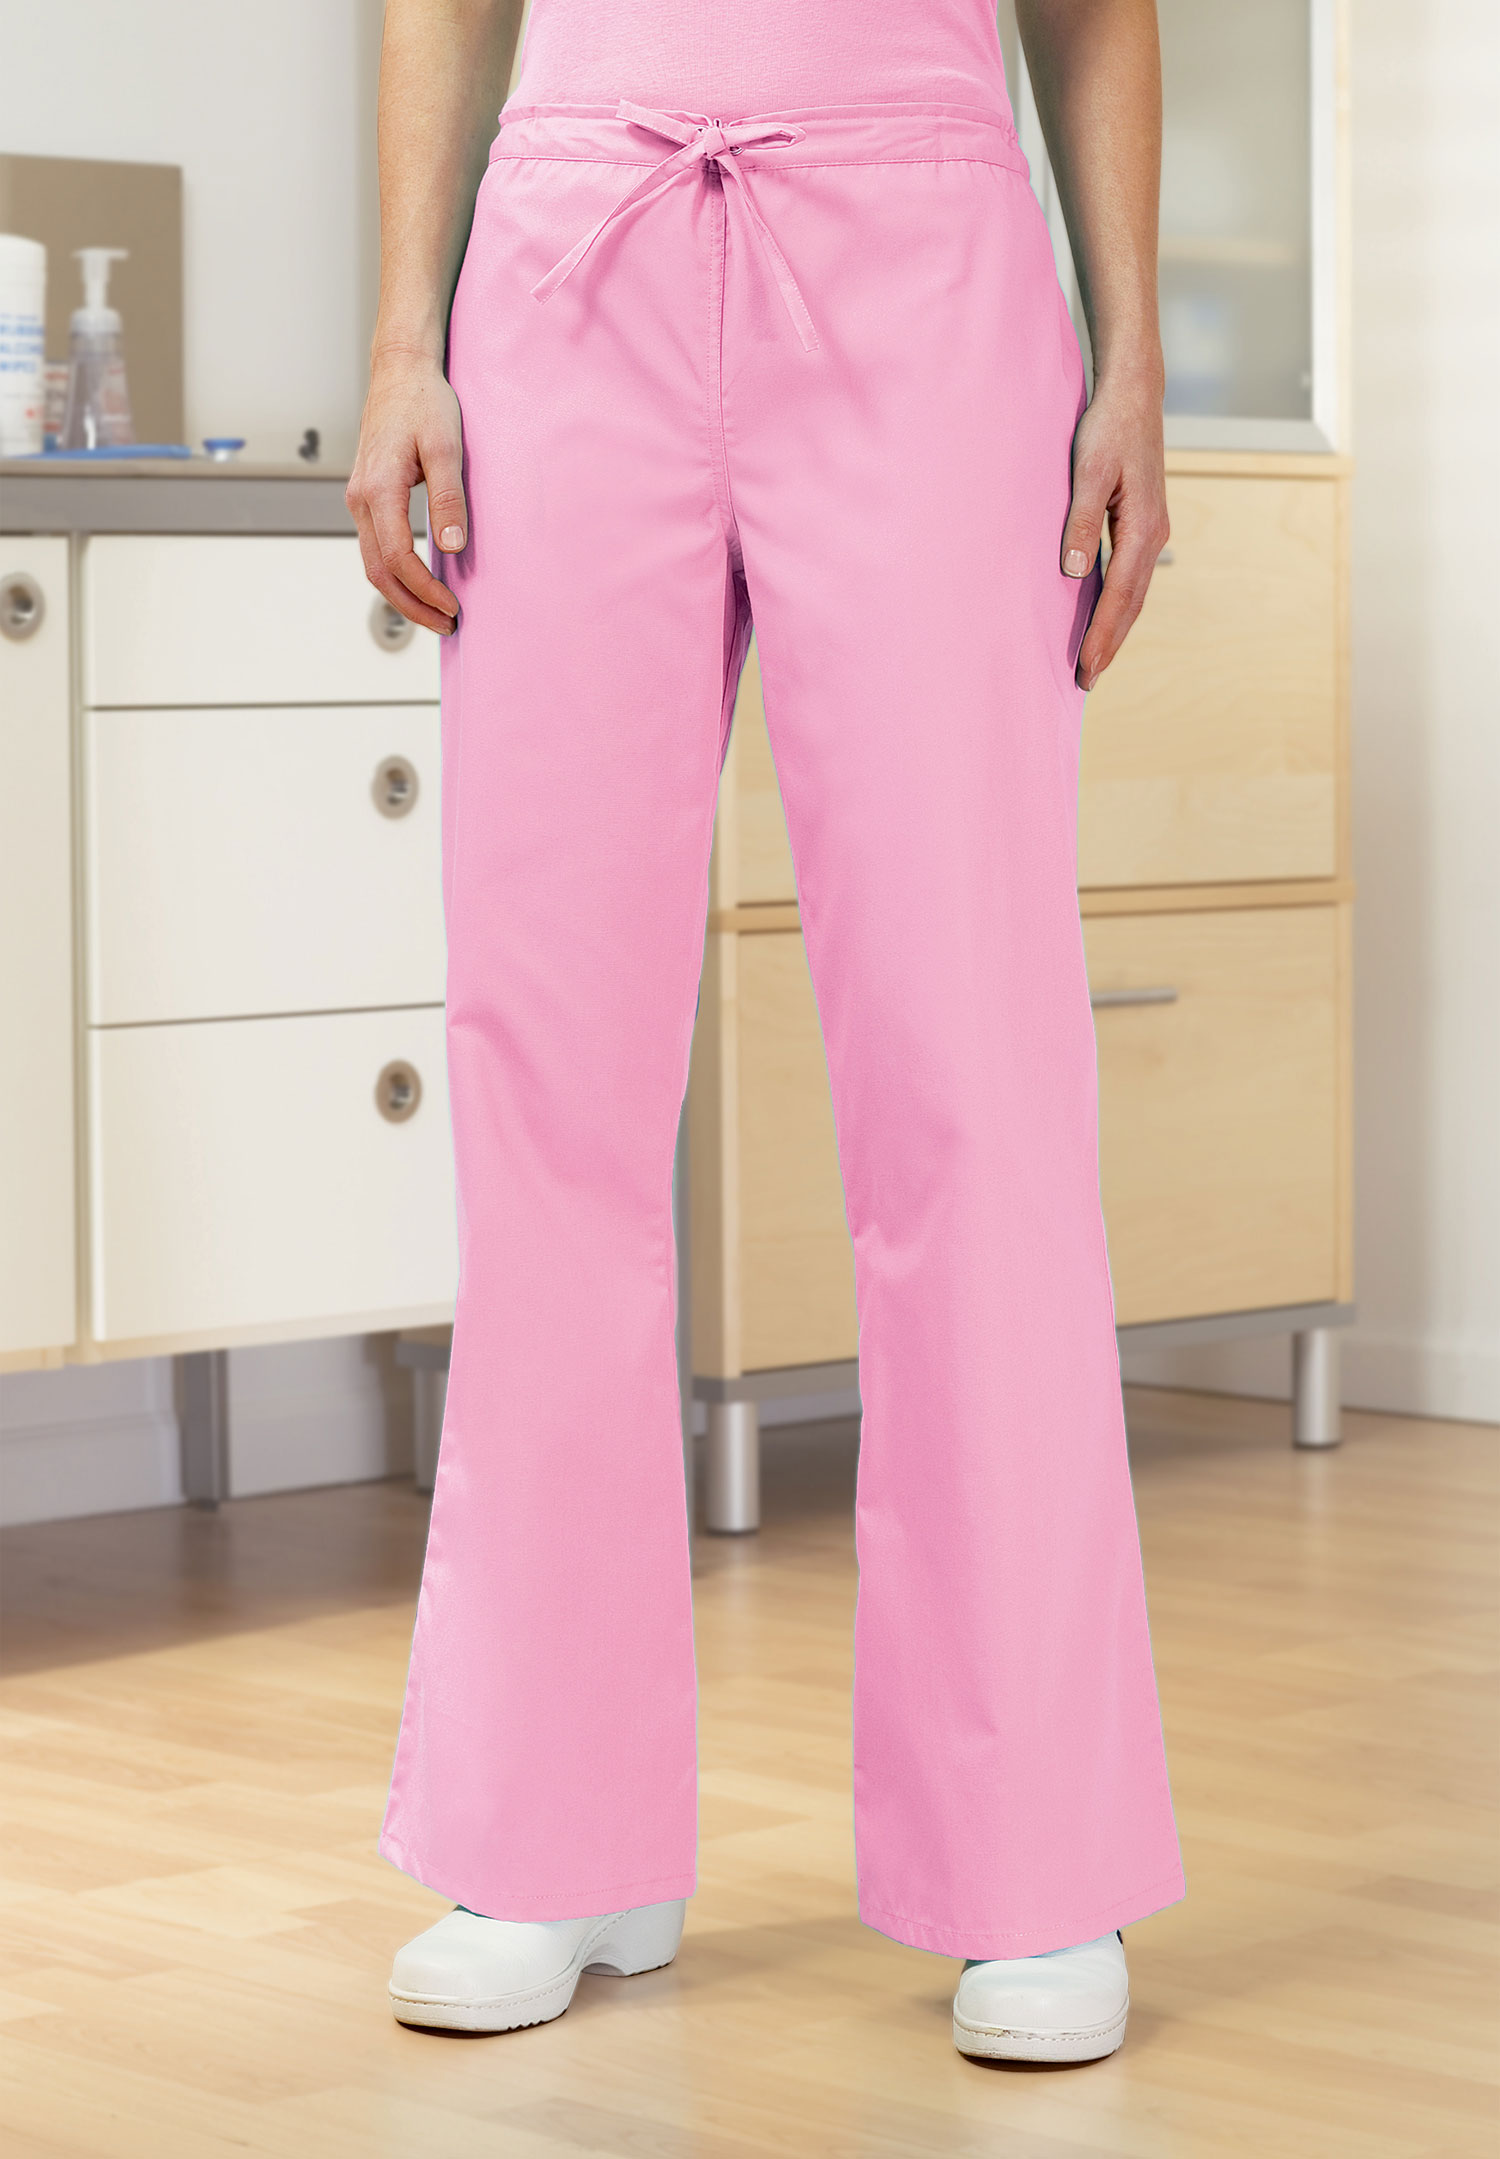 Essentials Flat Front Drawstring Scrub Pant